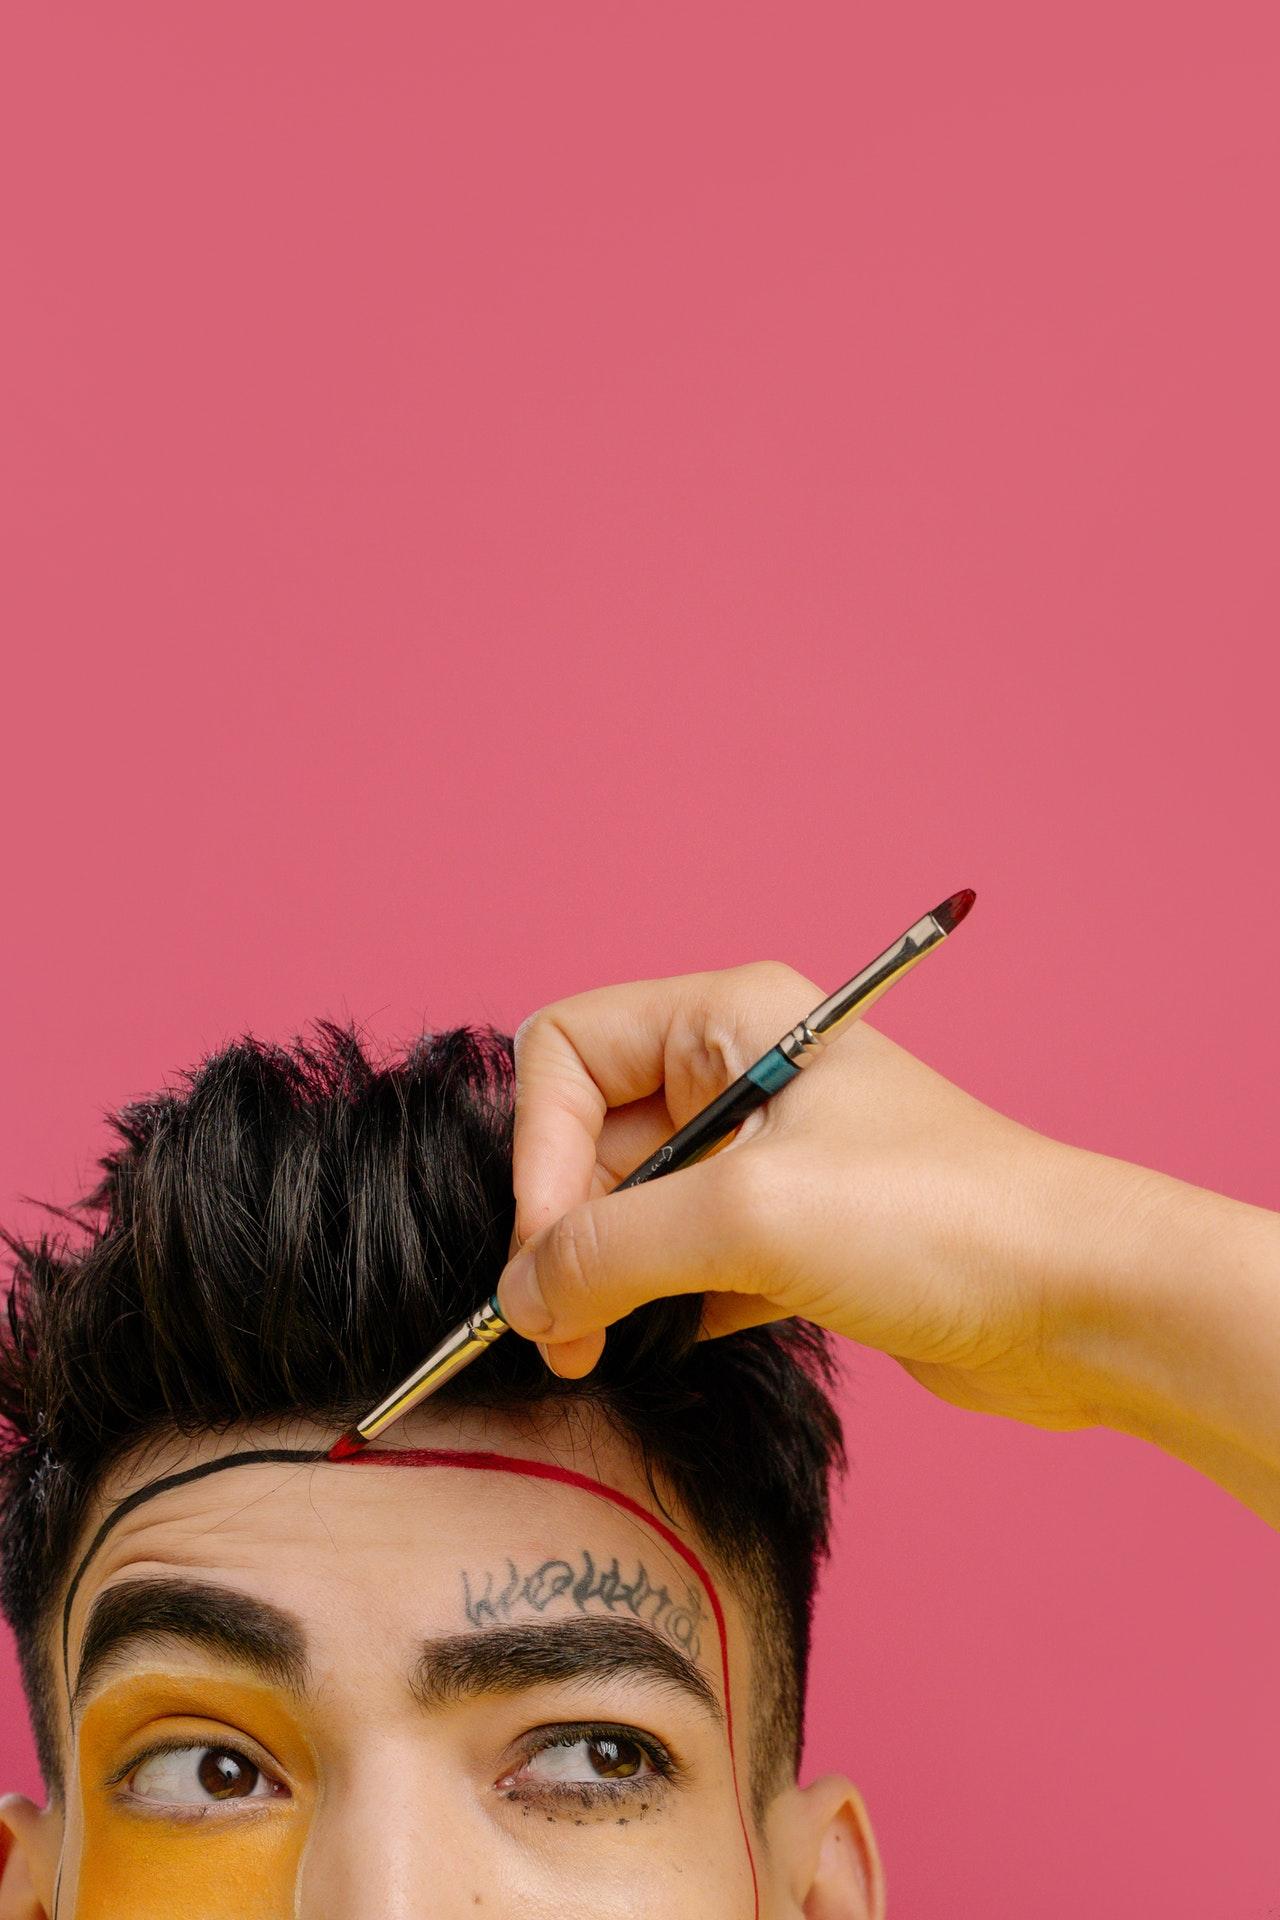 Entrecejo: ¿Arrugas o líneas de expresión?